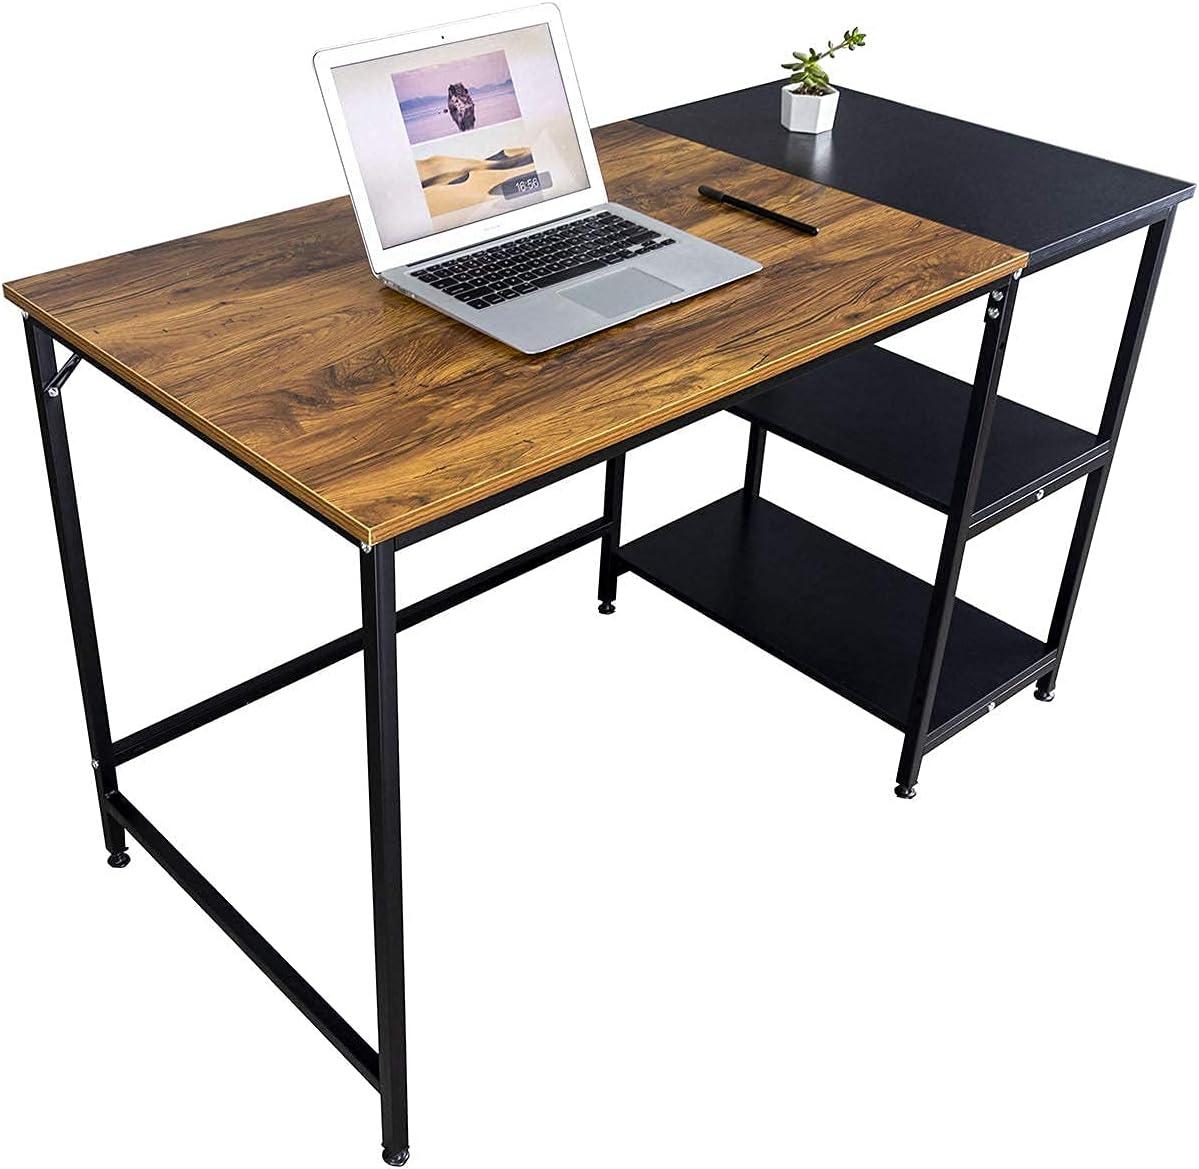 DIMAR GARDEN Computer pc Desk with Metal Storage Shelvesfor Home Office Laptop Desk Gaming Table IndustrialStudy Writing TableWorkstation